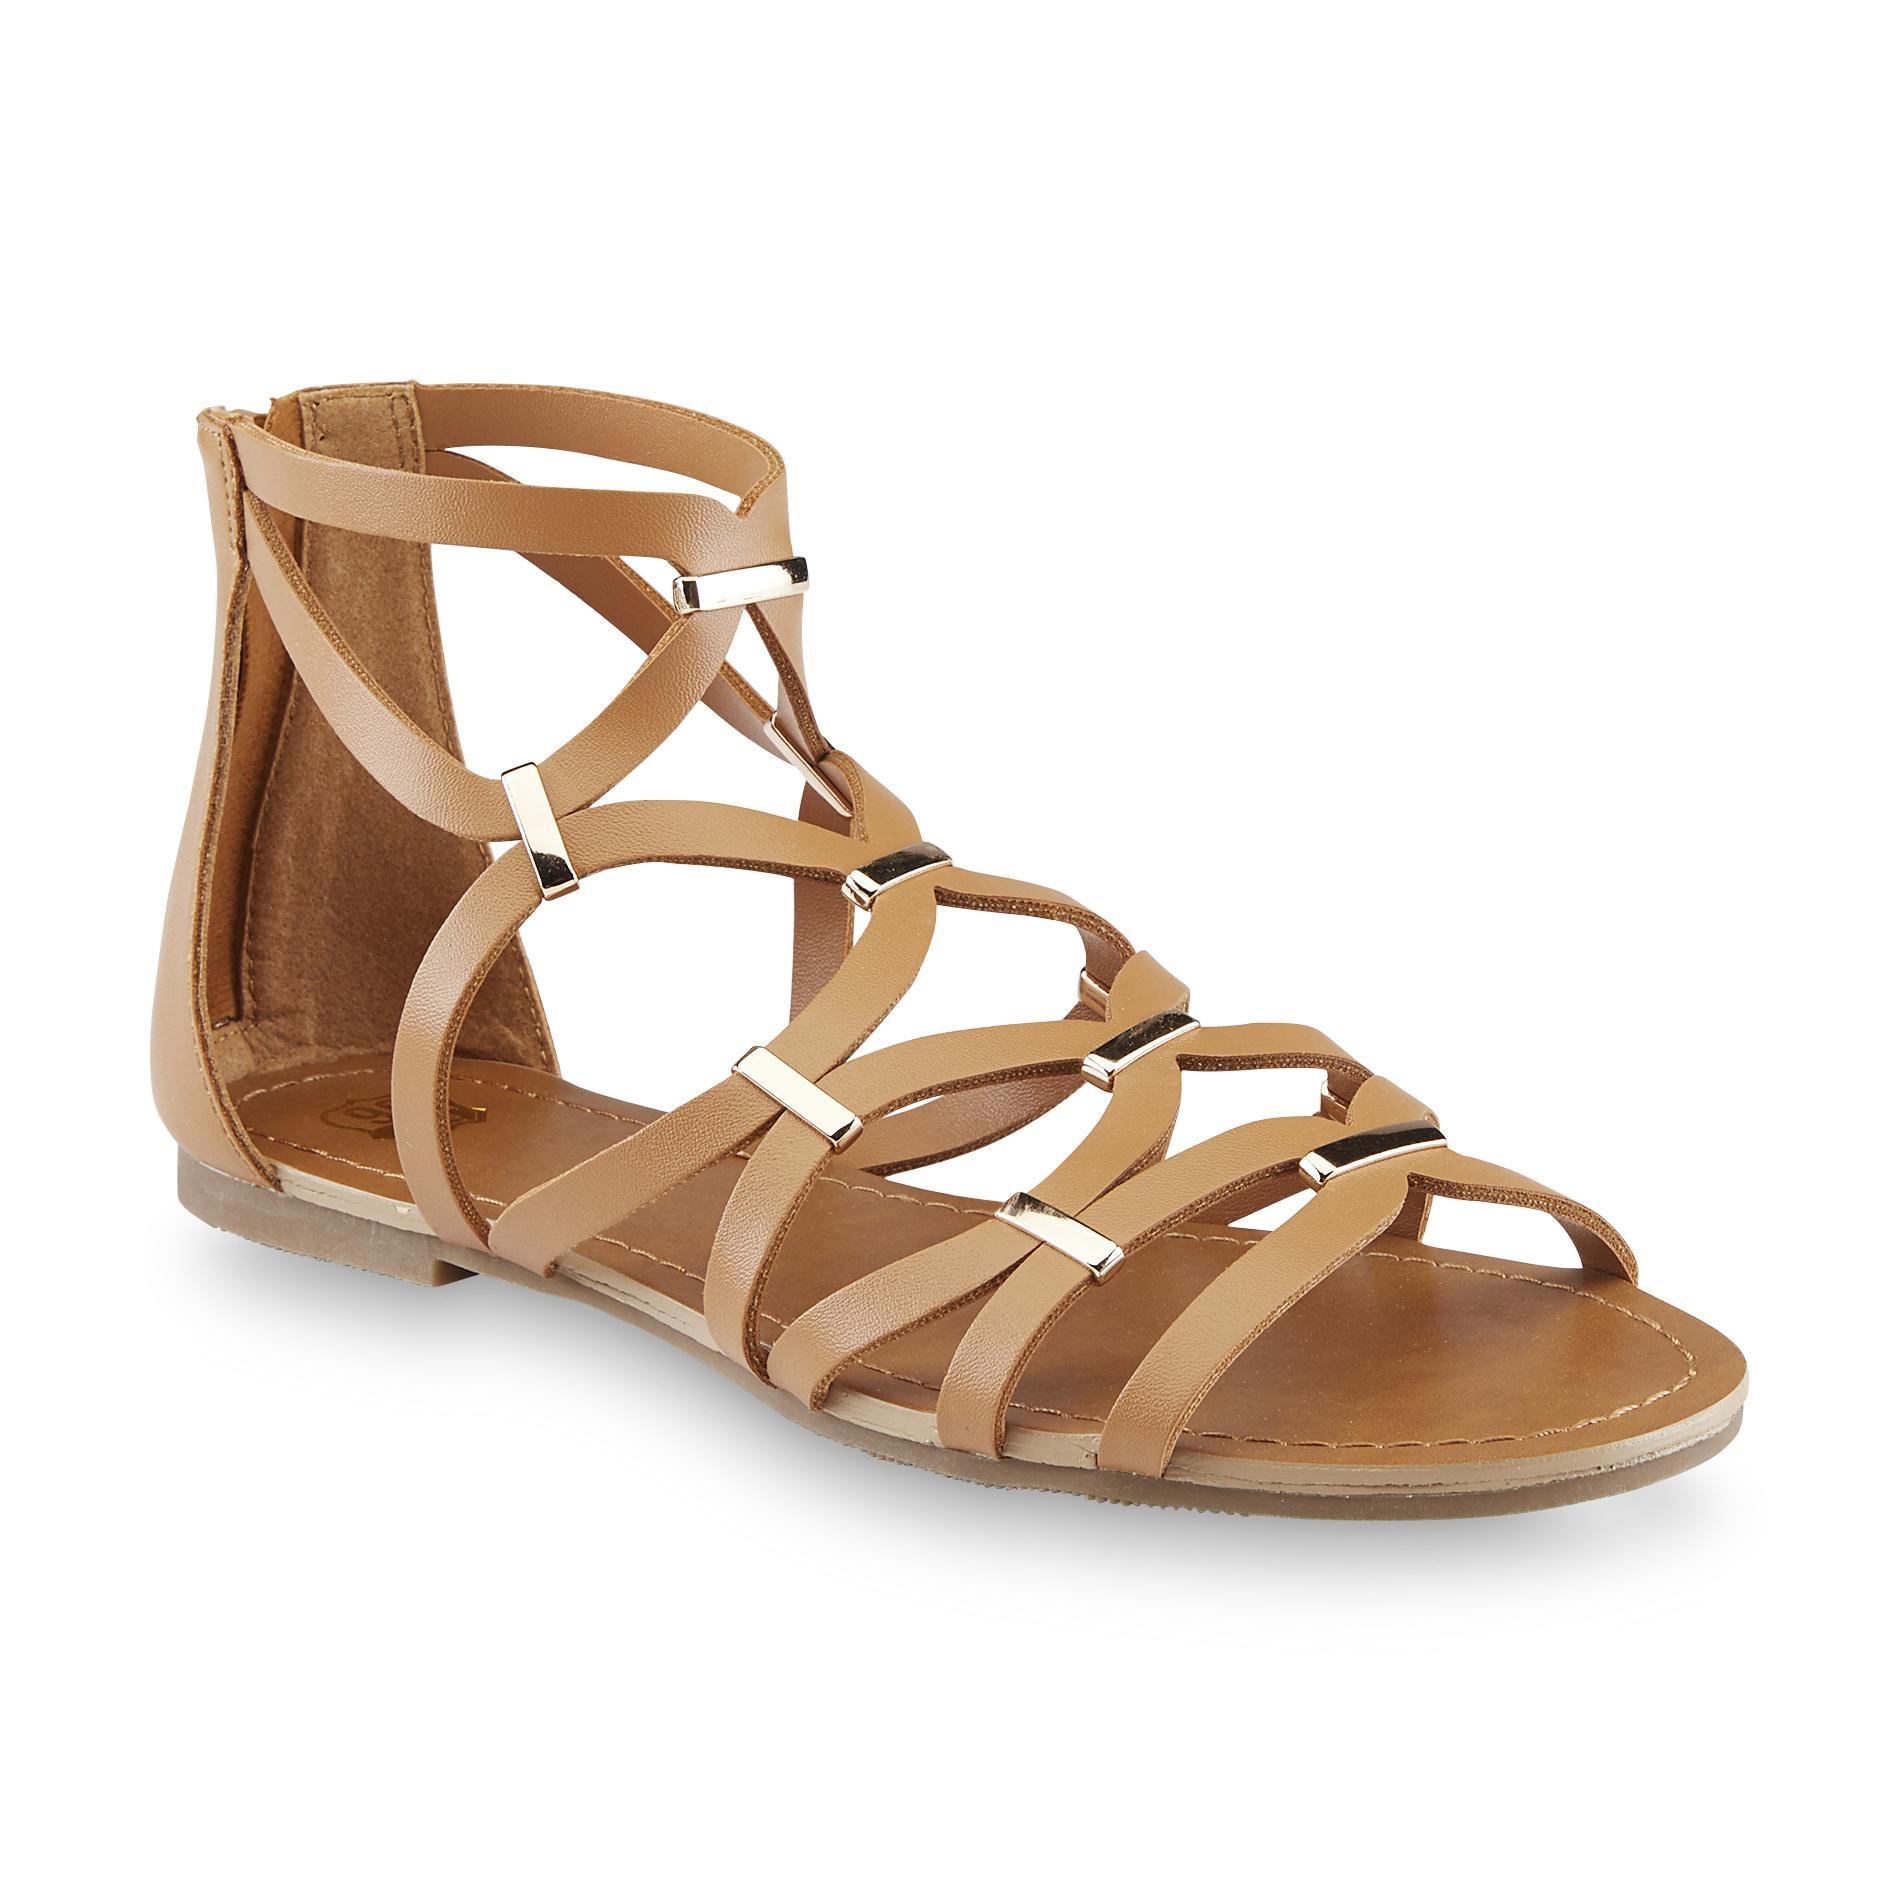 Route 66 women s alva brown embellished gladiator sandal shoes women s shoes women s sandals